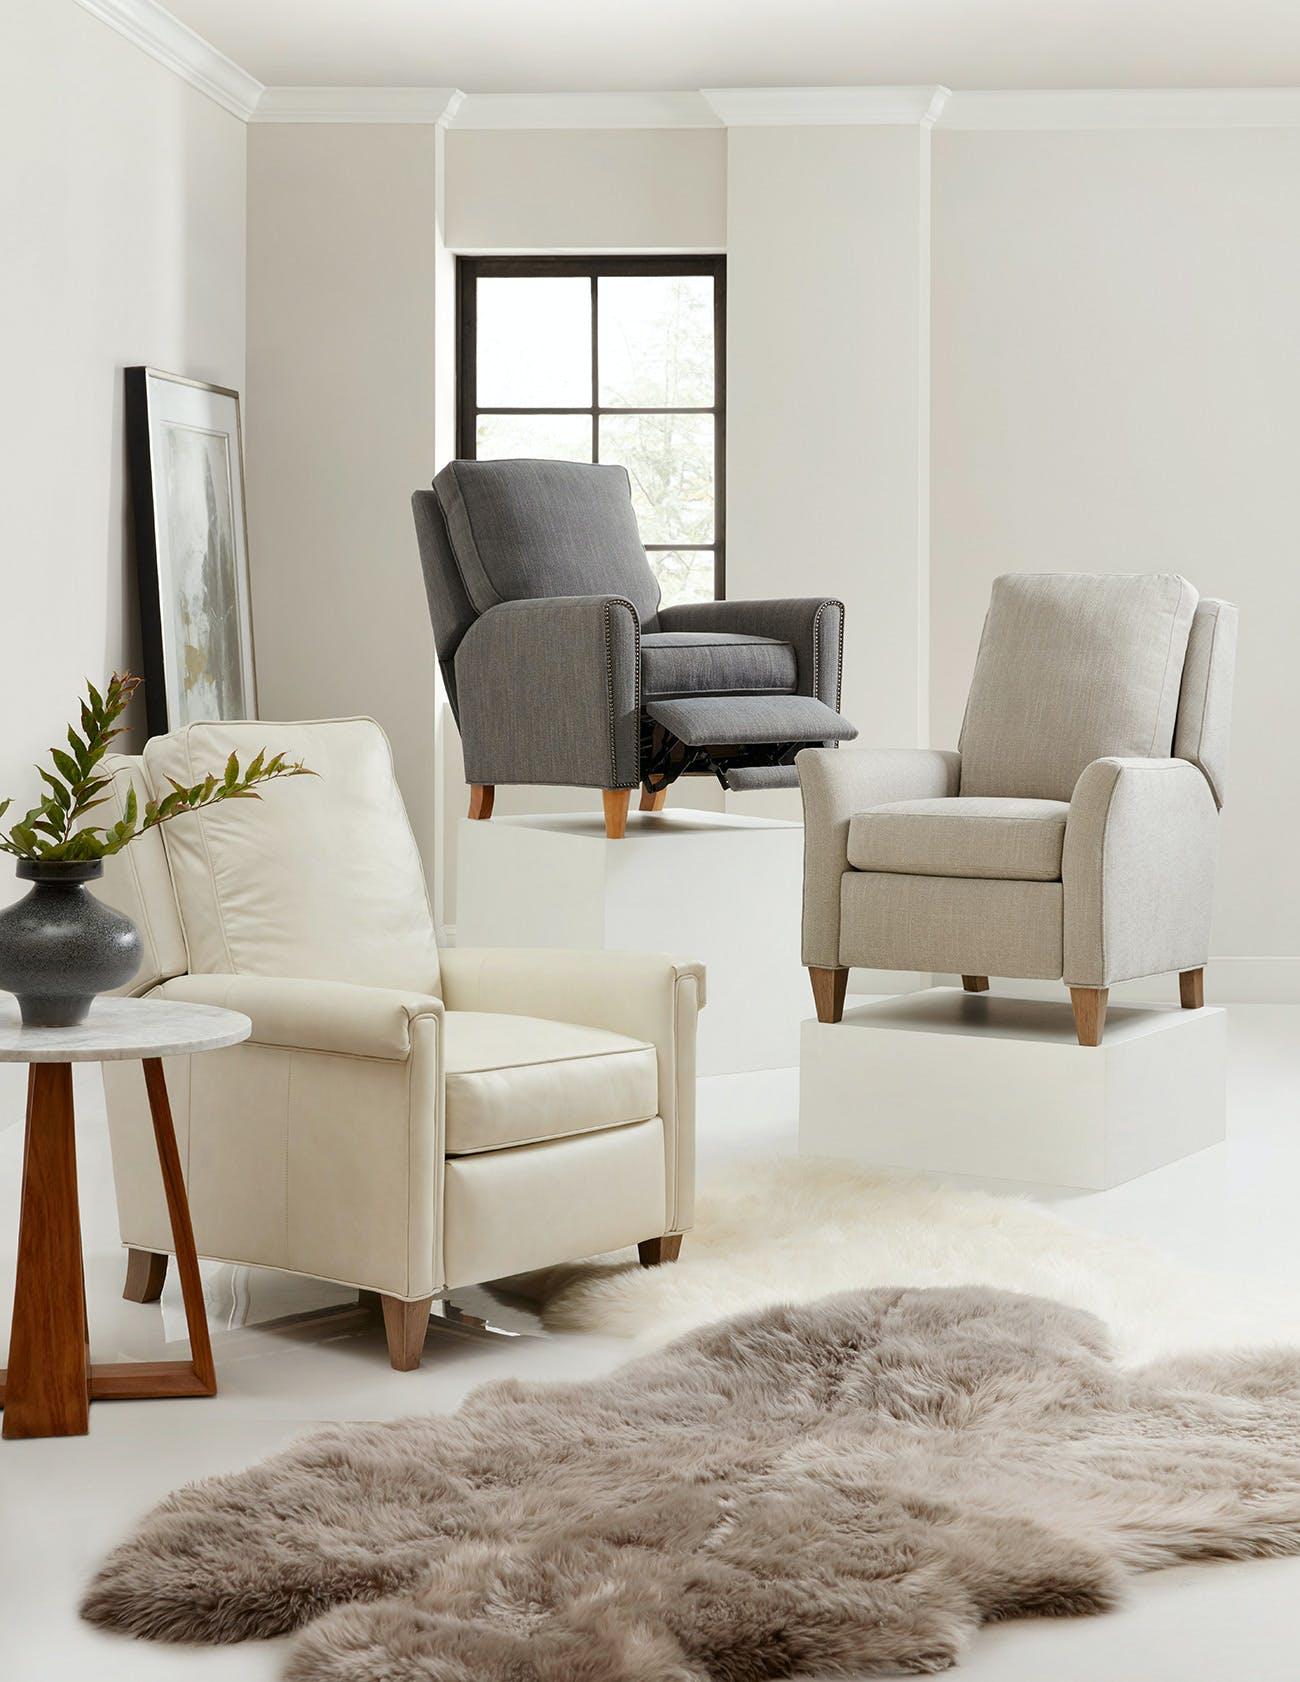 Bradington-Young Chairs